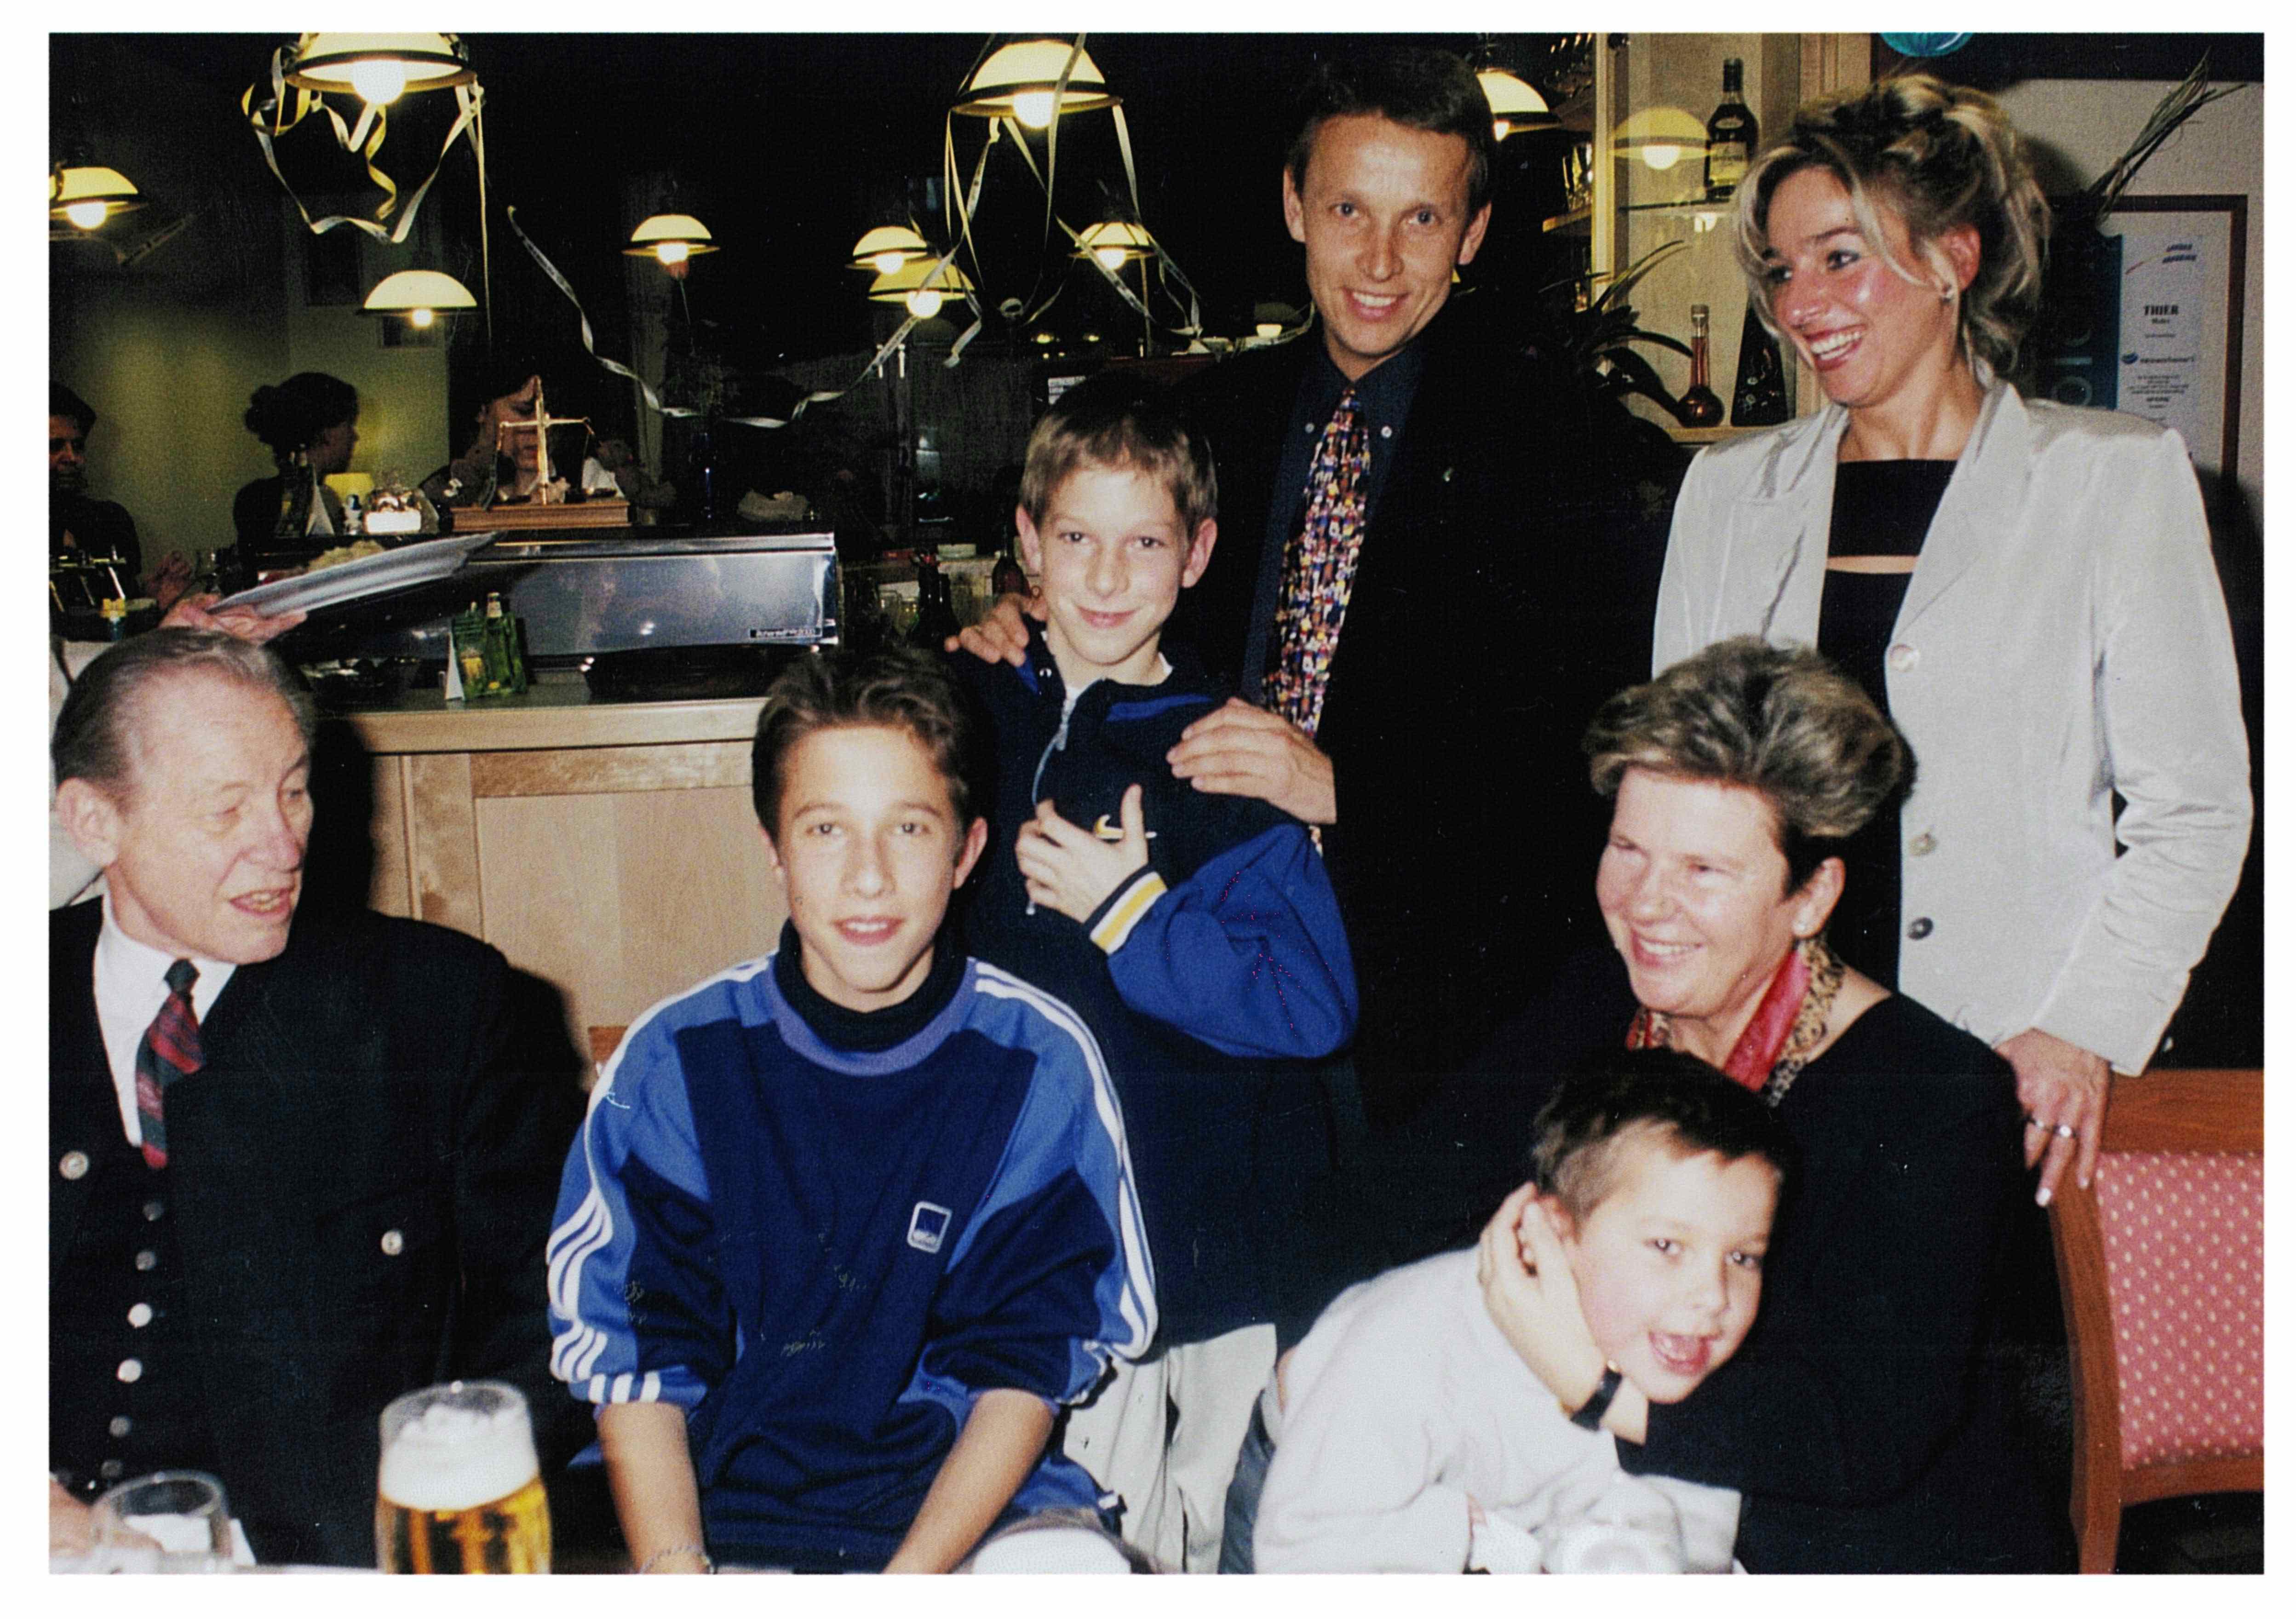 Familie Lopatka mit Waltraud Klasnic